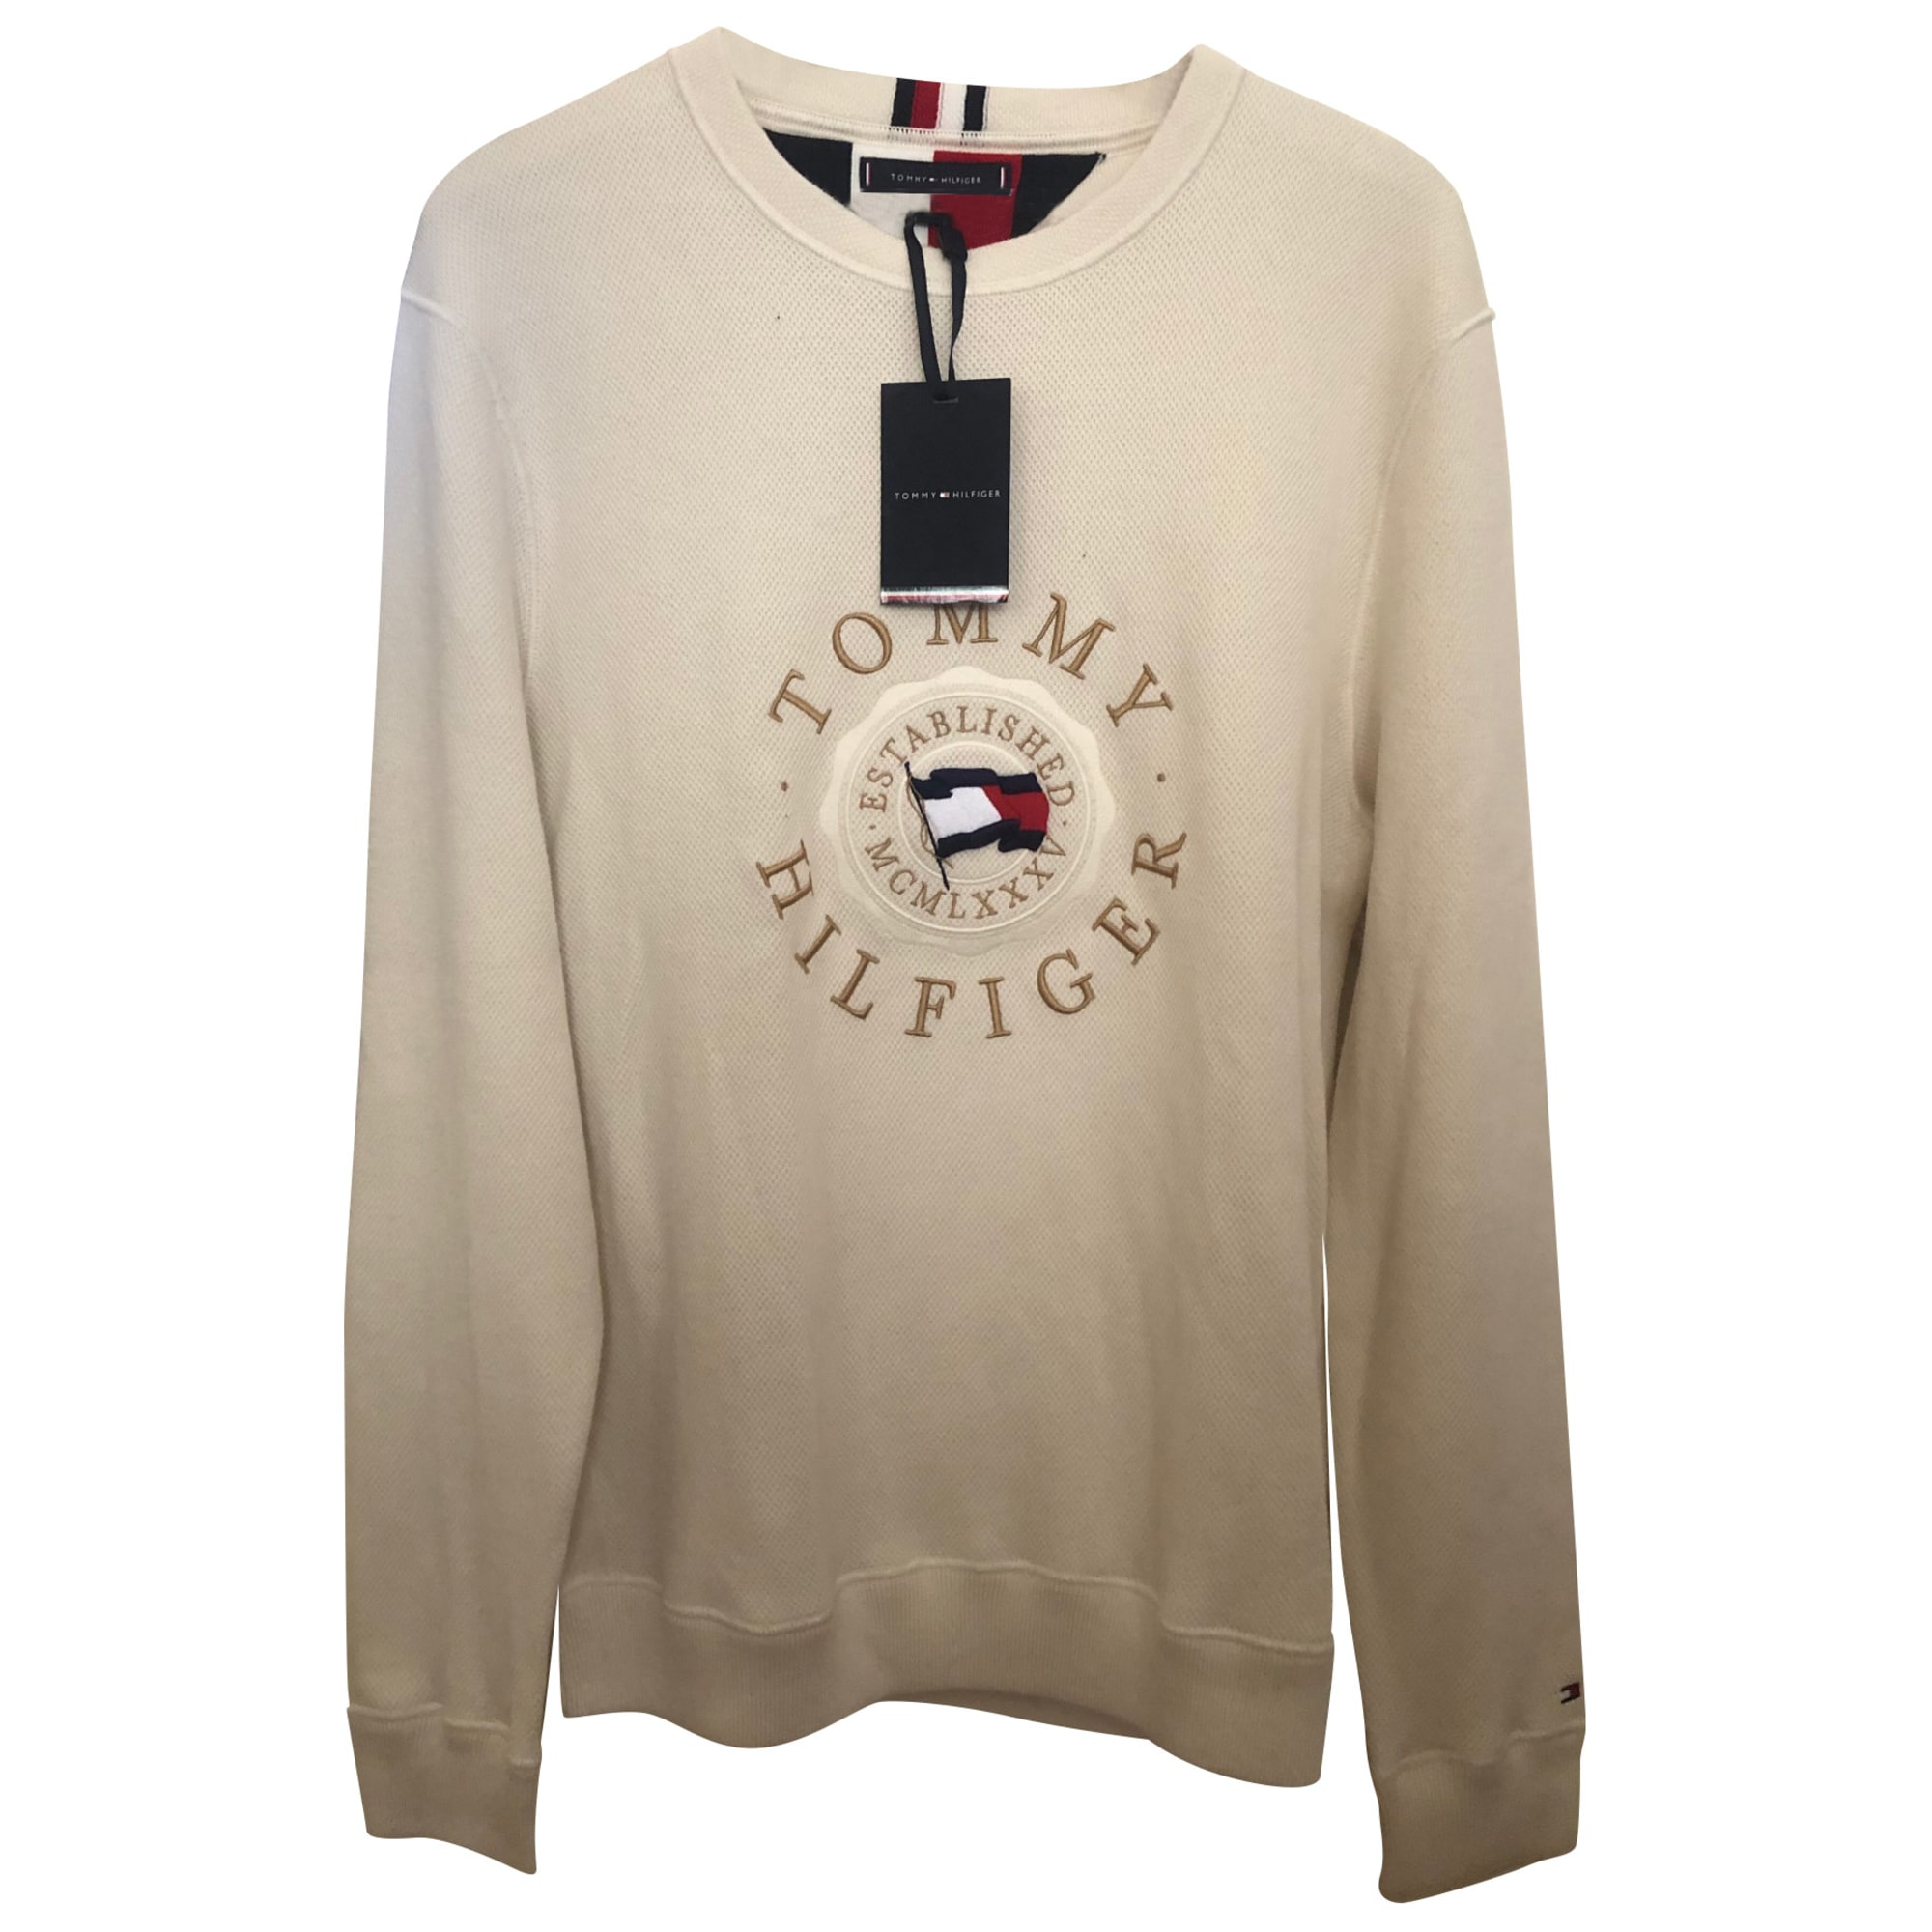 Sweater TOMMY HILFIGER White, off-white, ecru